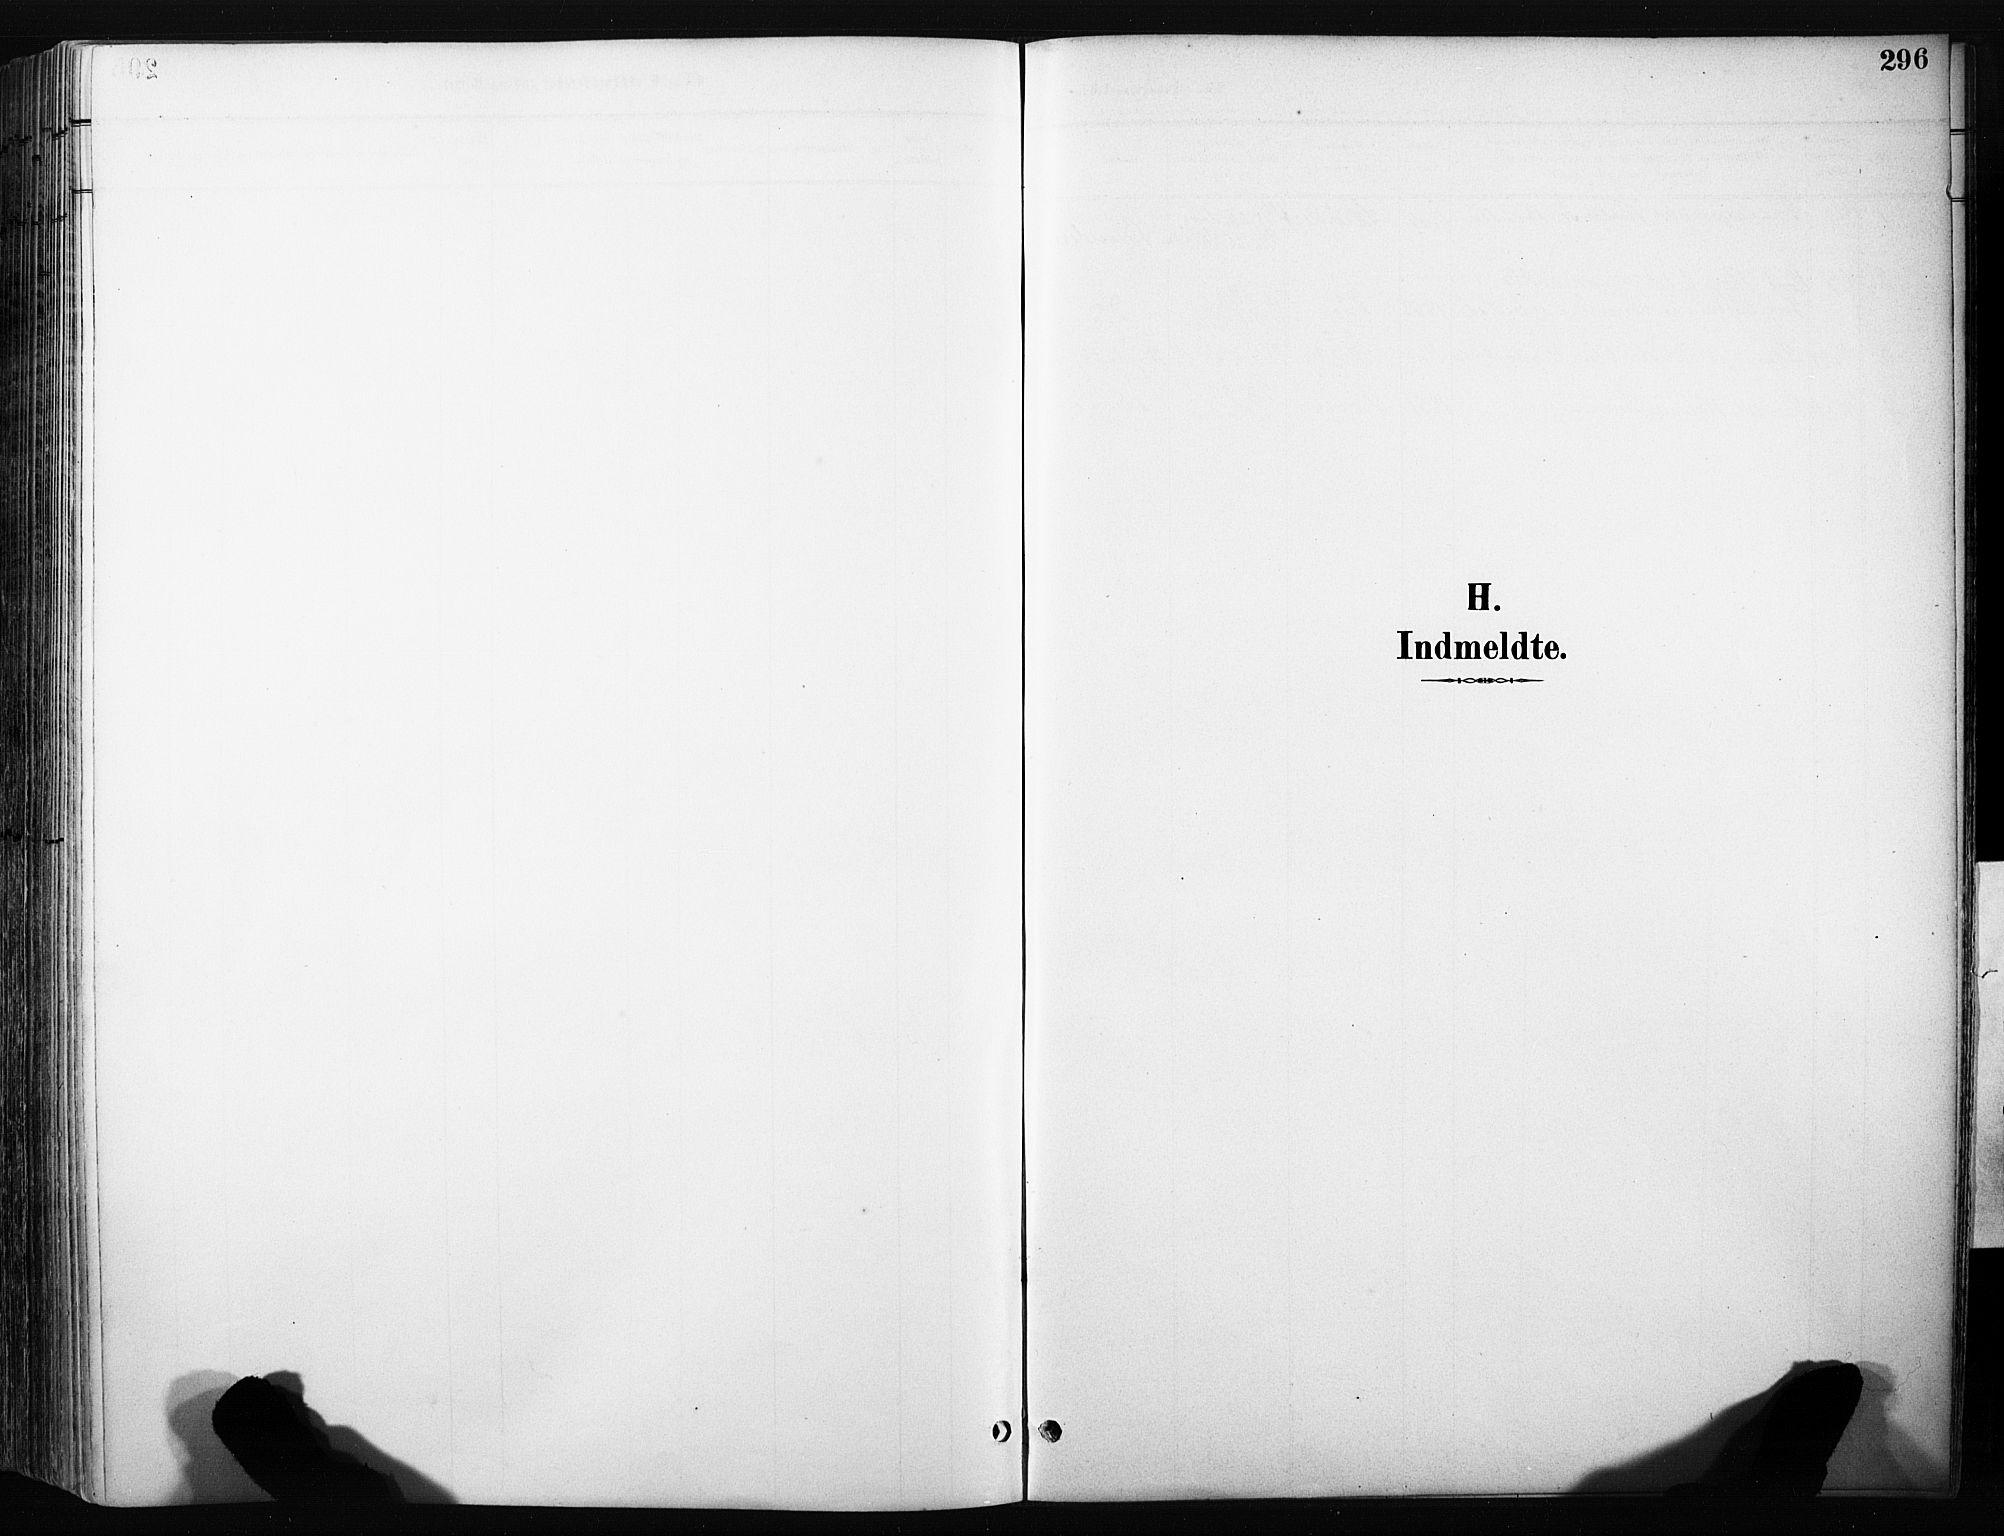 SAH, Skjåk prestekontor, Klokkerbok nr. 3, 1893-1932, s. 296